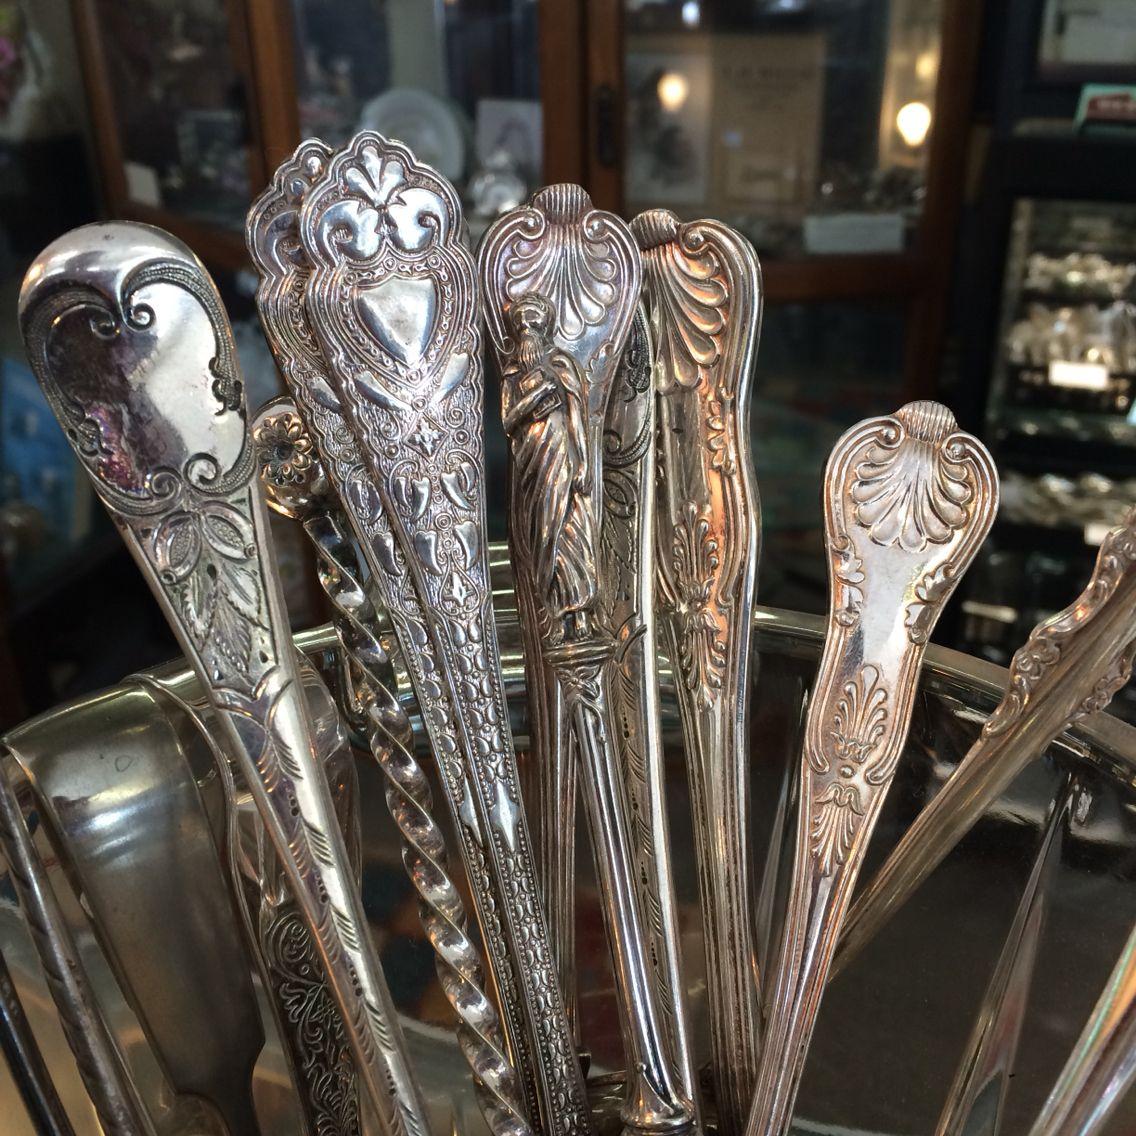 Love vintage silver, the details!!!